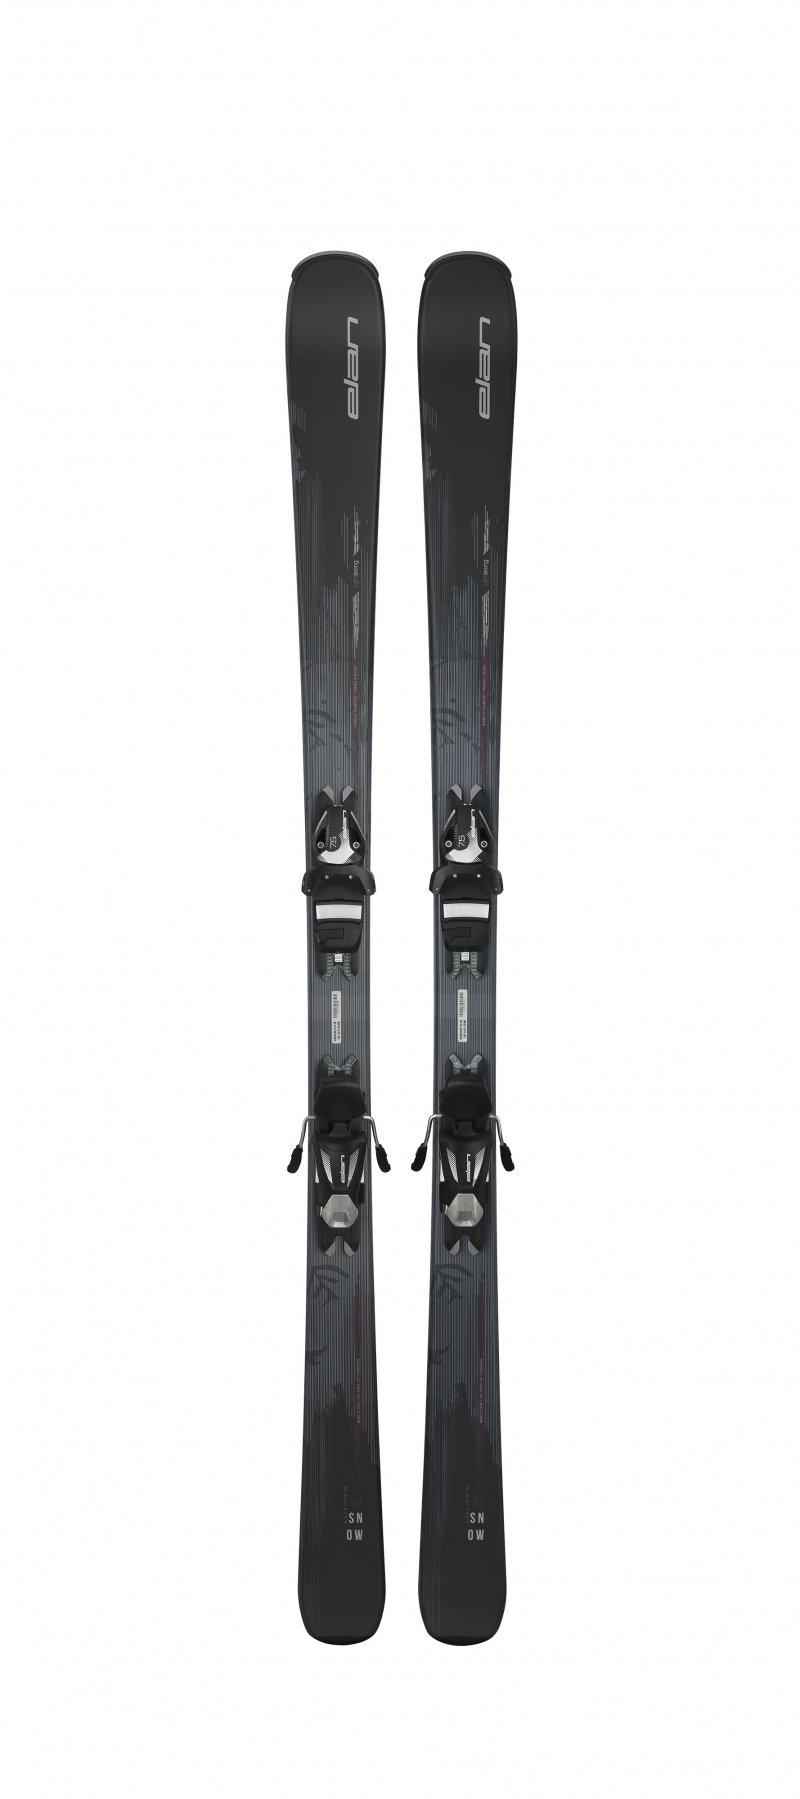 Image 0 of ELAN - SNOW LS Skis 140cm, w/EL7.5 GripWalk Binding  - 2019